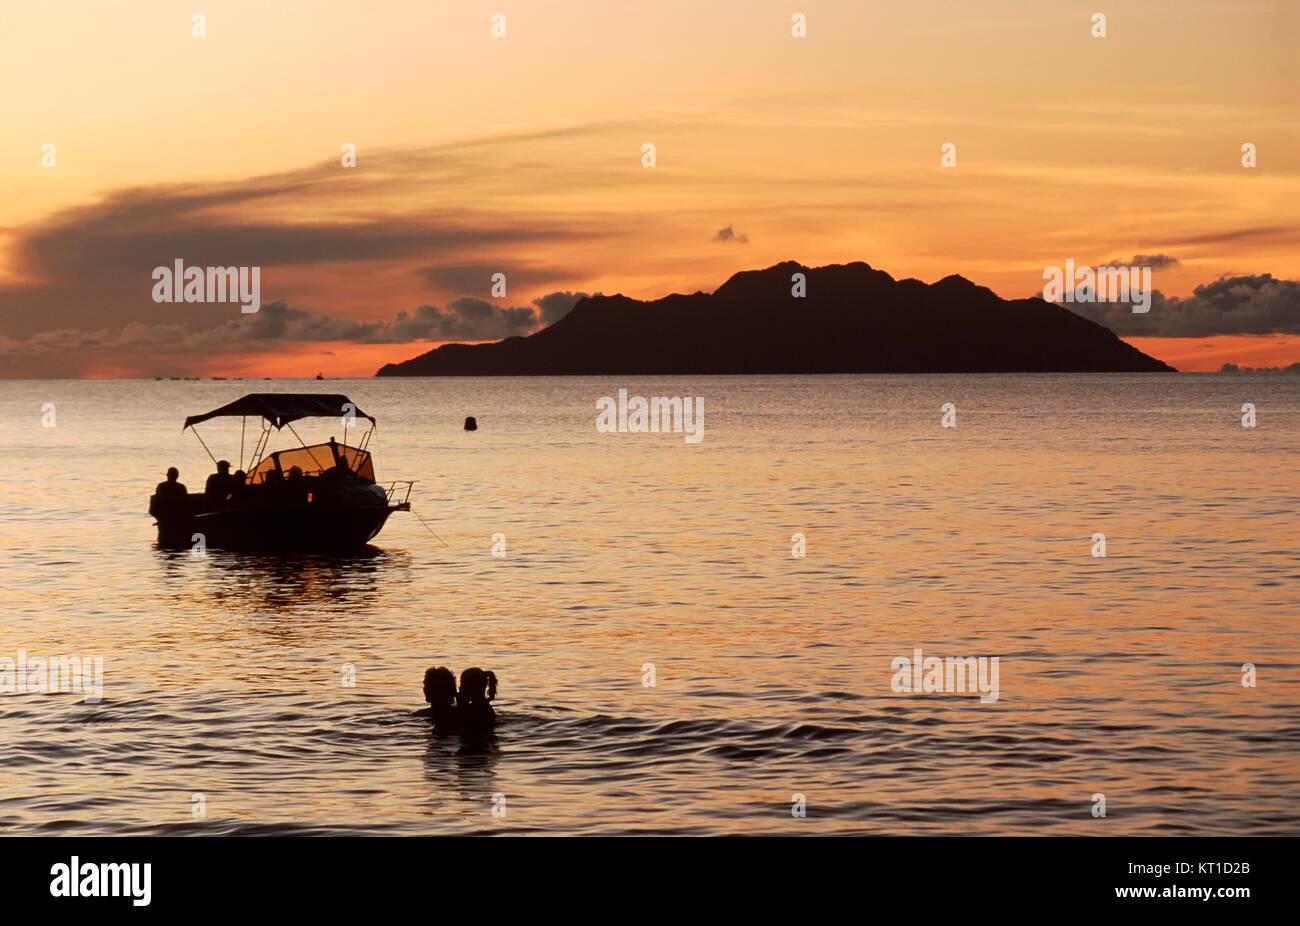 Sunset at Mahe Beach, Mahe island, Seychelles - Stock Image